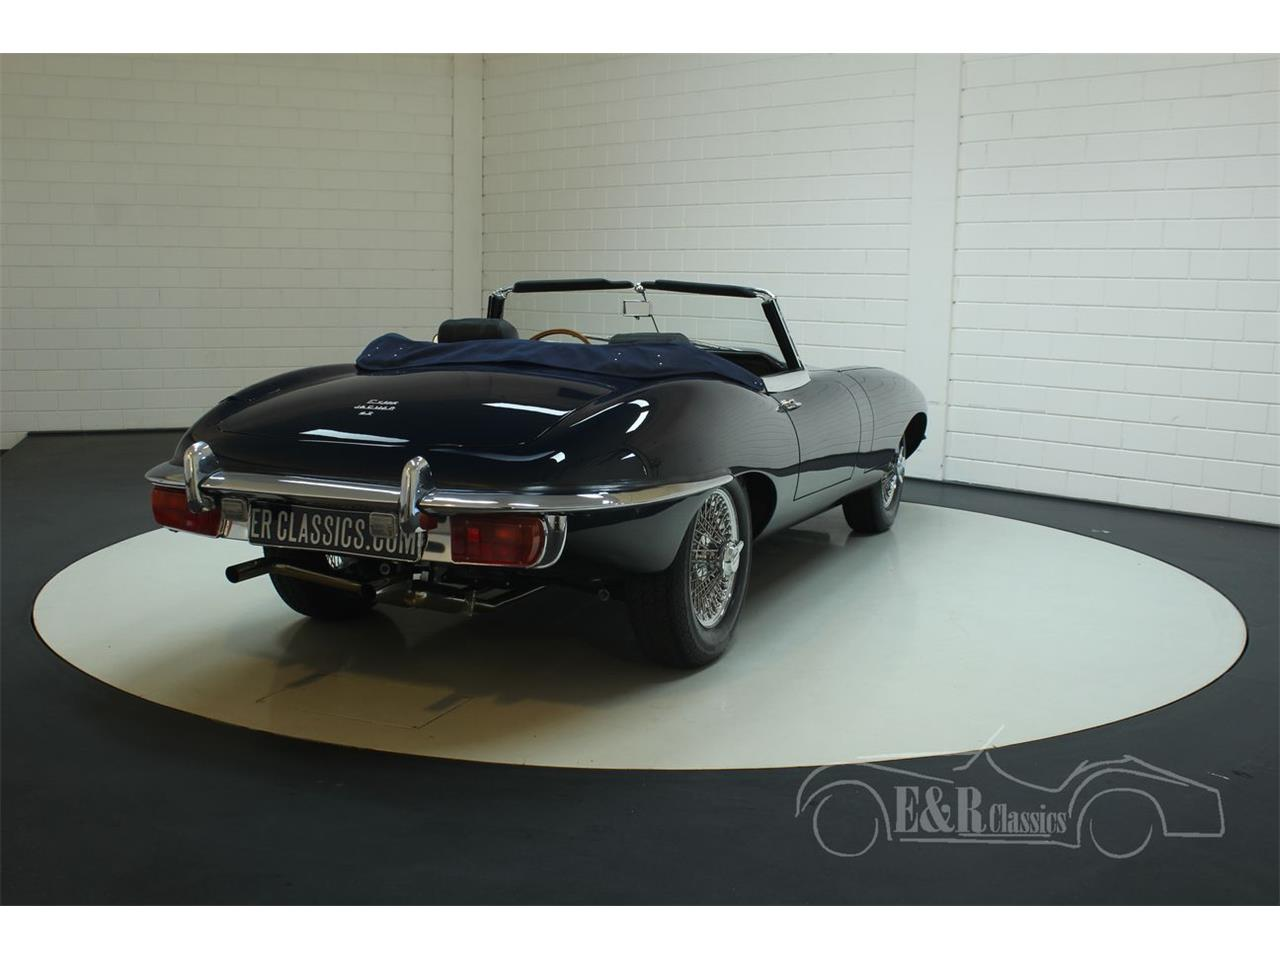 Large Picture of Classic 1969 Jaguar E-Type - $139,400.00 - Q45K